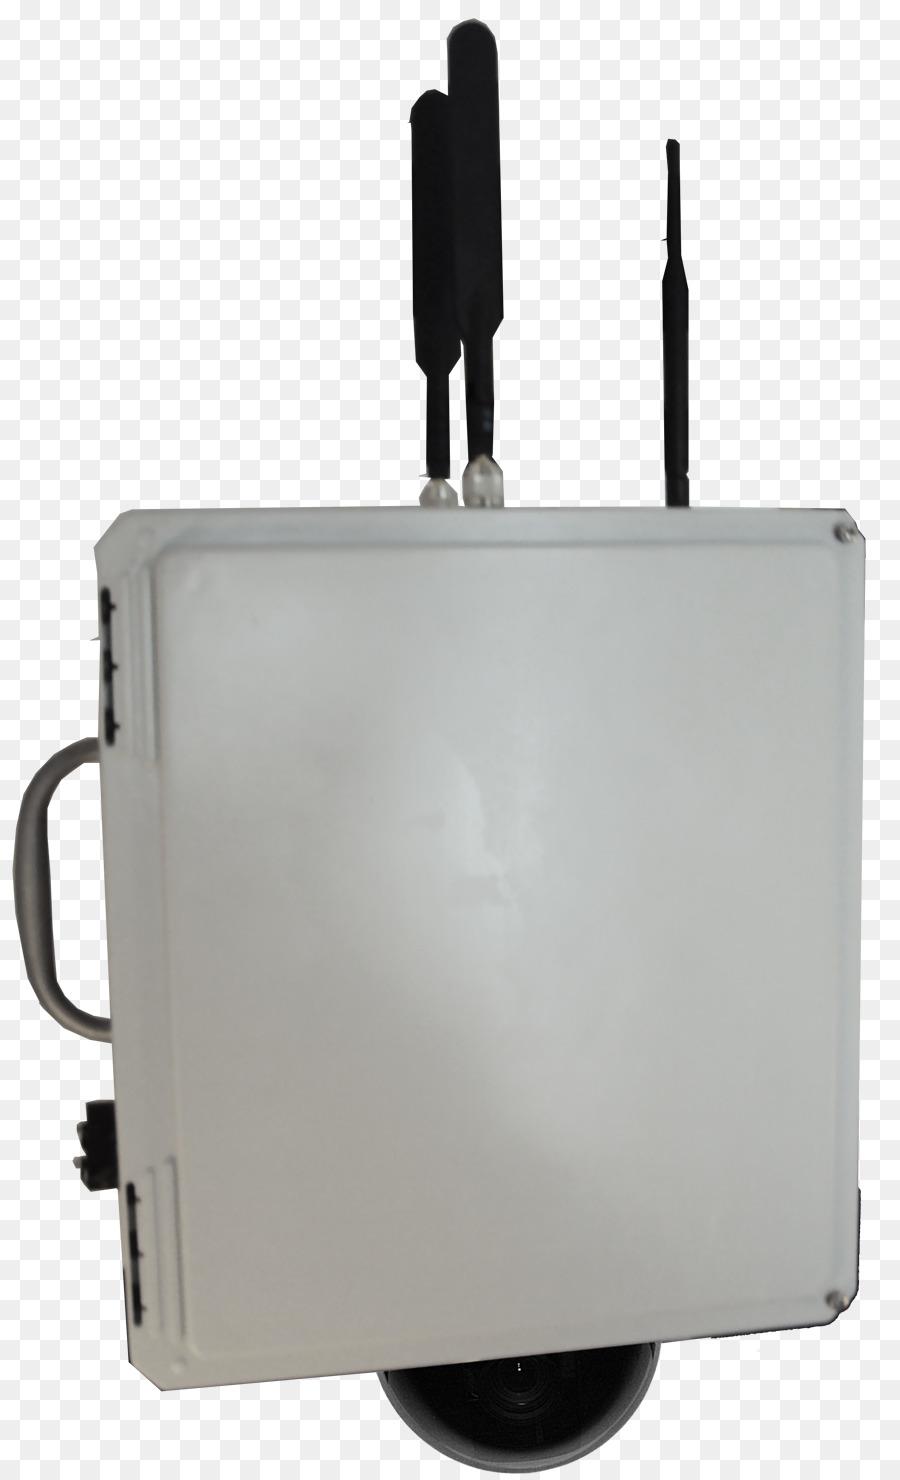 Closed Circuit Television Pantiltzoom Camera Surveillance Wiring Diagram